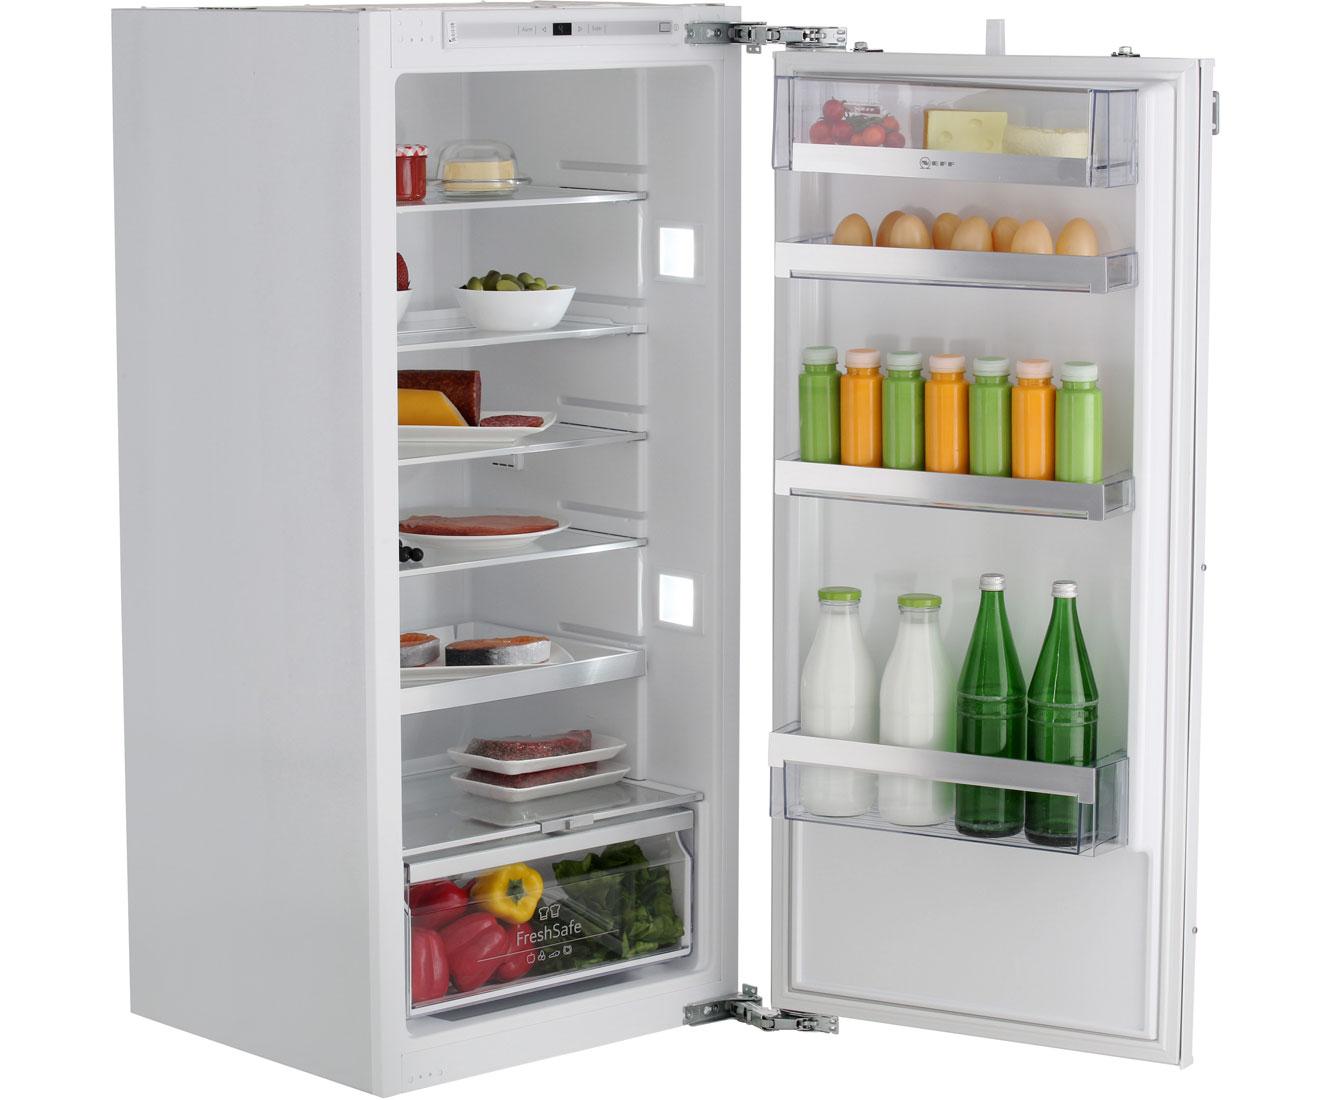 Mini Kühlschrank Bomann Kb 167 : Husky cool cube mini kühlschrank coca cola design ebay